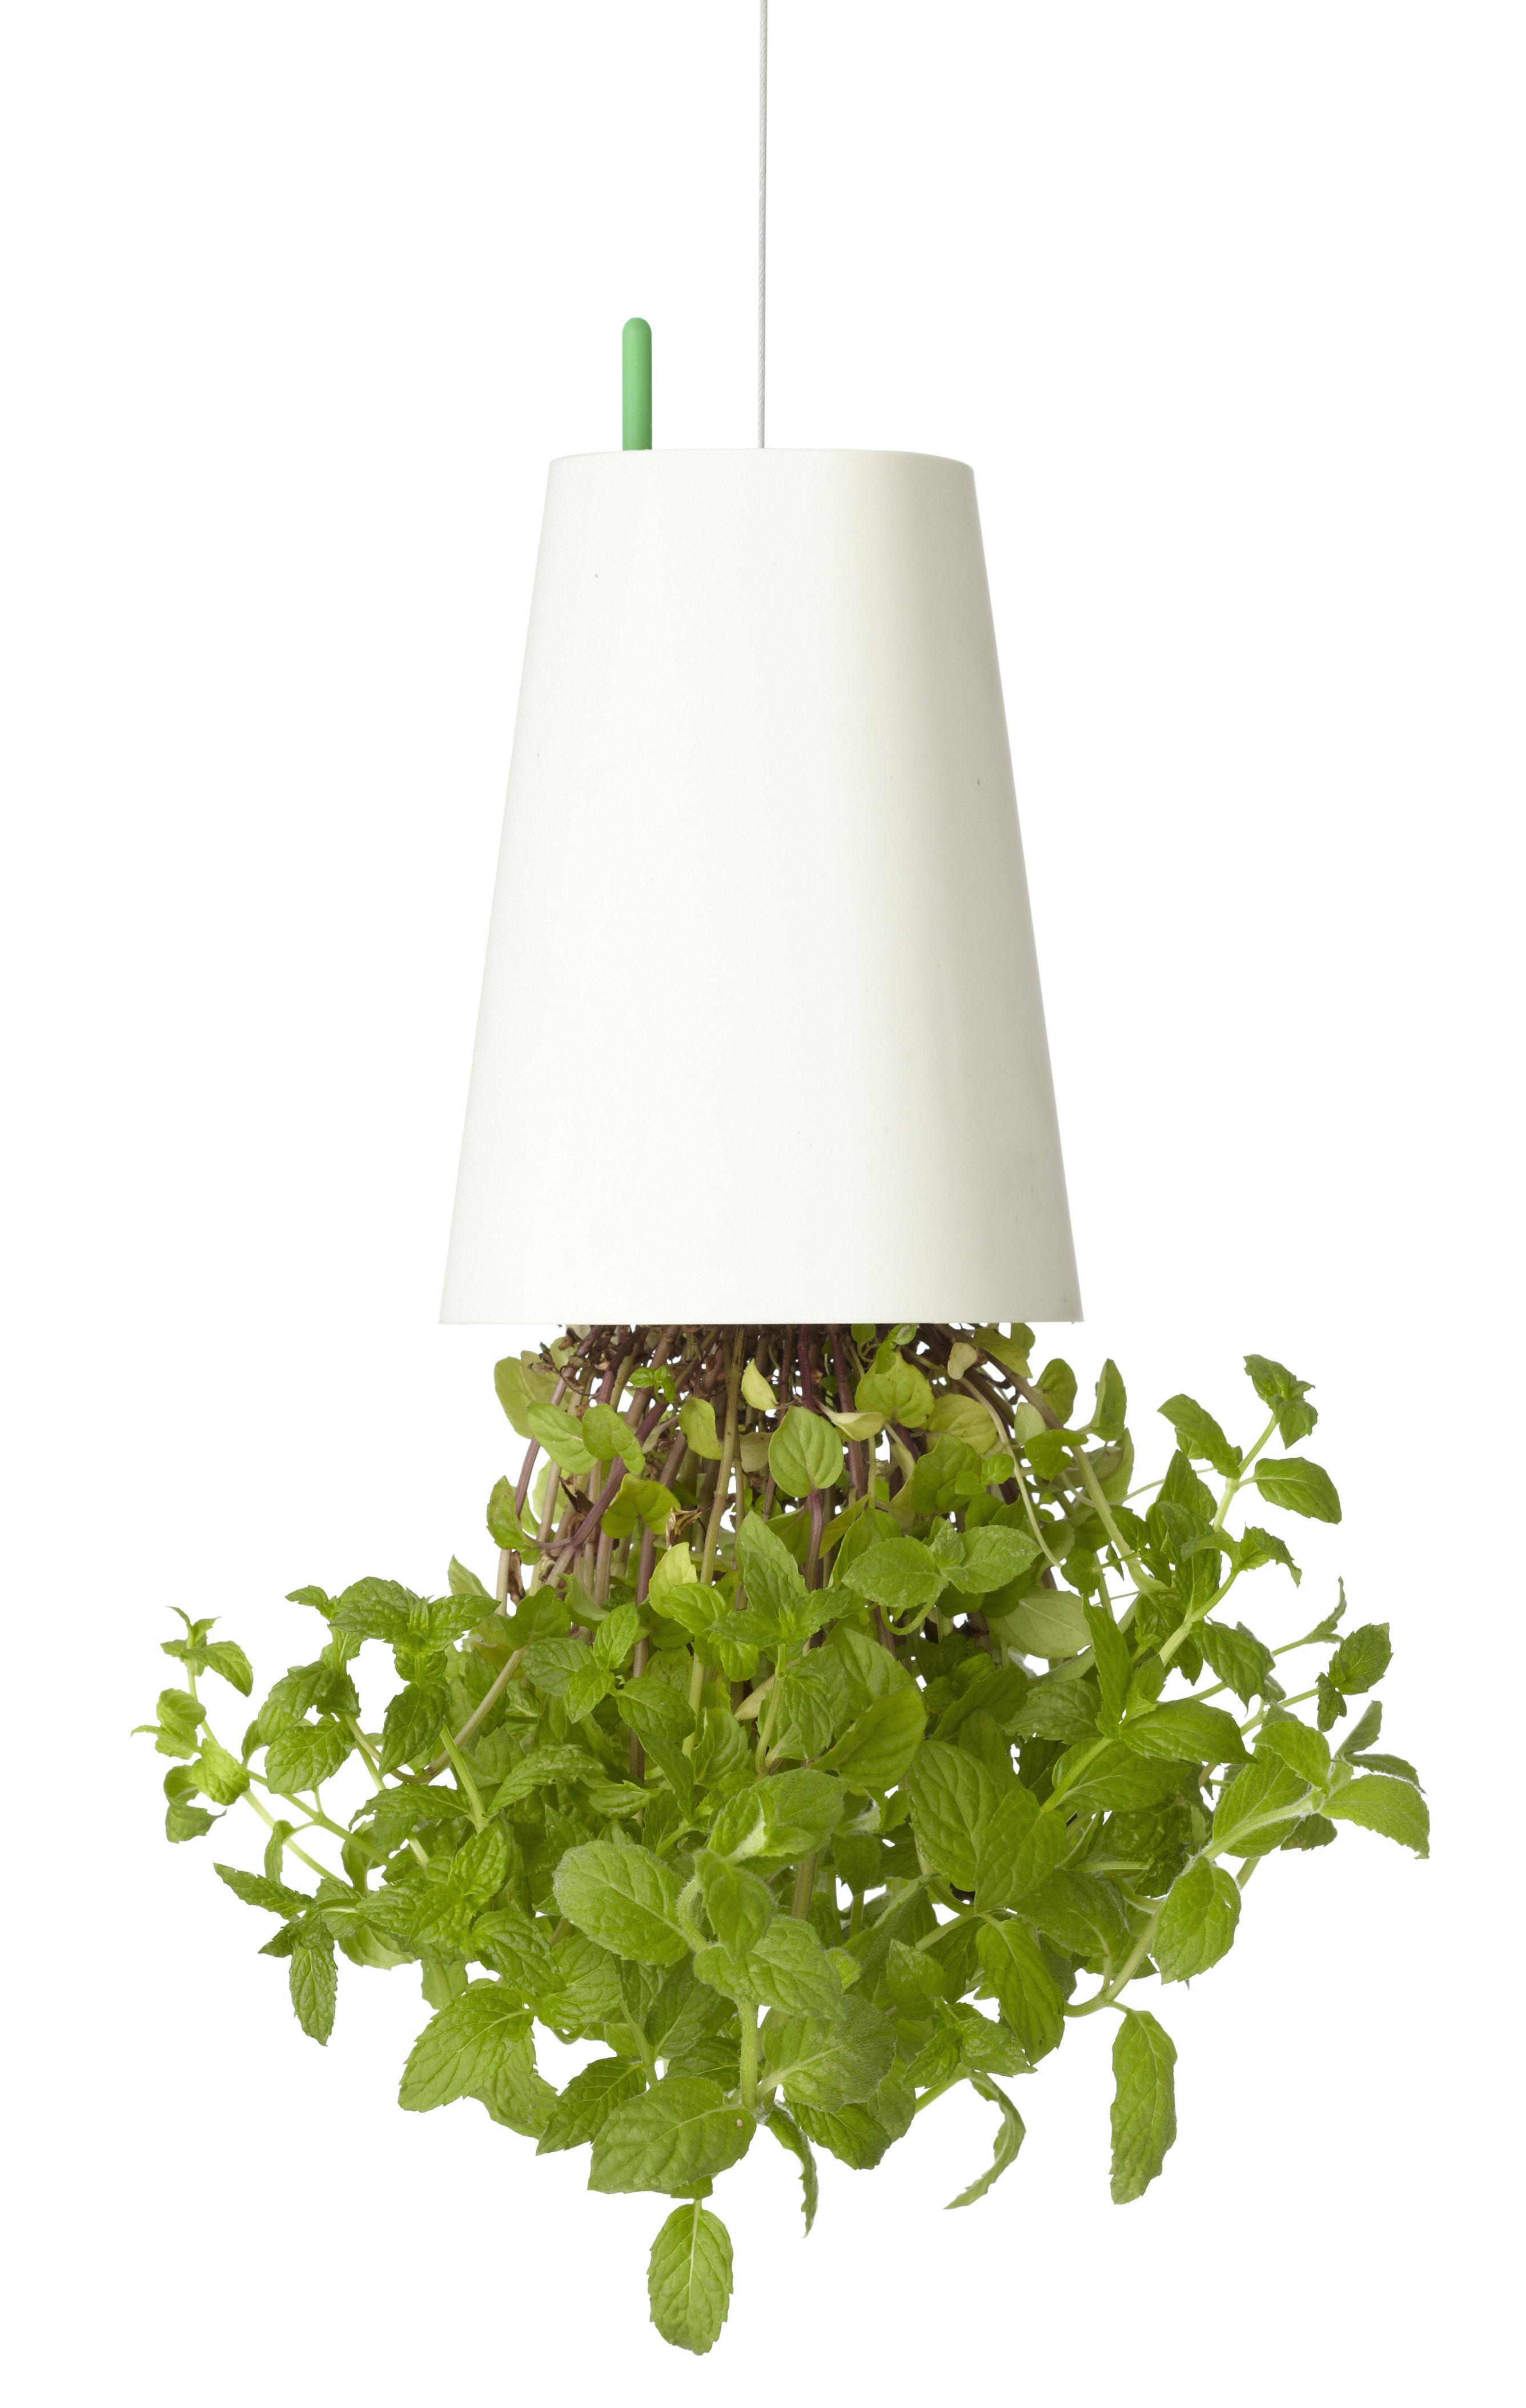 Decoration - Funny & surprising - Sky Planter - Polypropylene Small - H 13 cm / Upside down planter by Boskke - White - Recycled polypropylene